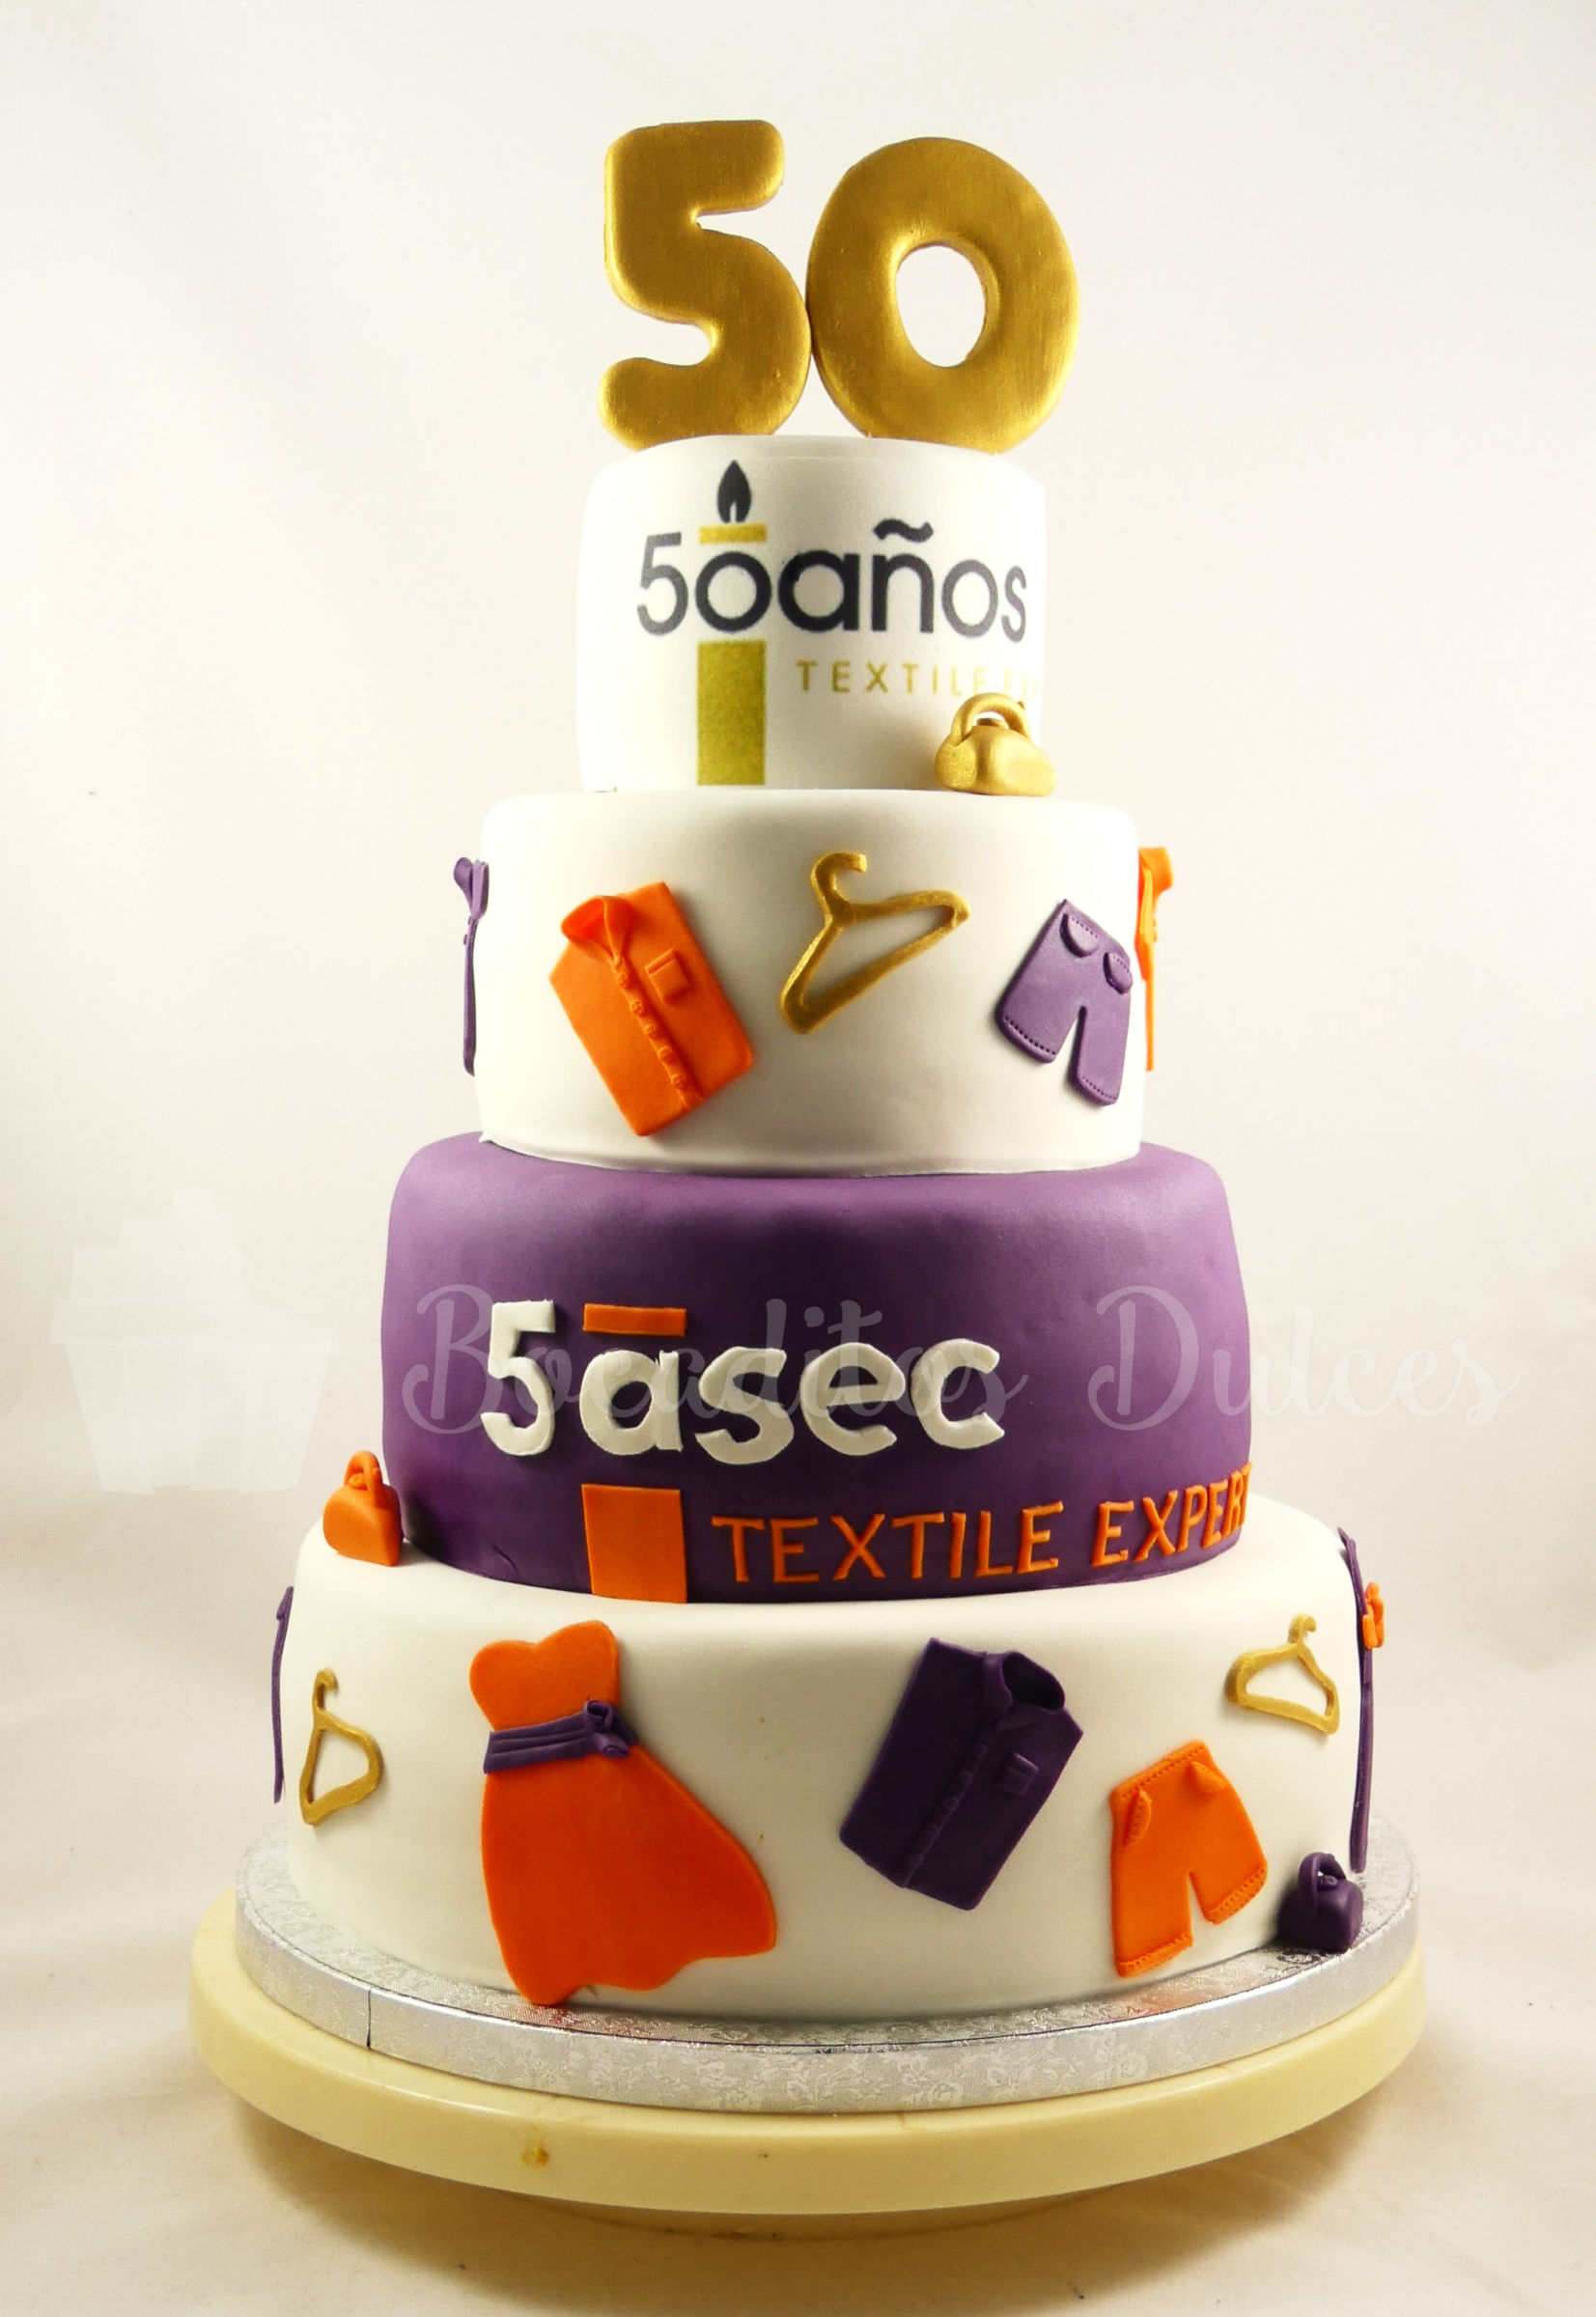 tarta de varios pisos de fondant para el 50 aniversario de 5 a sec